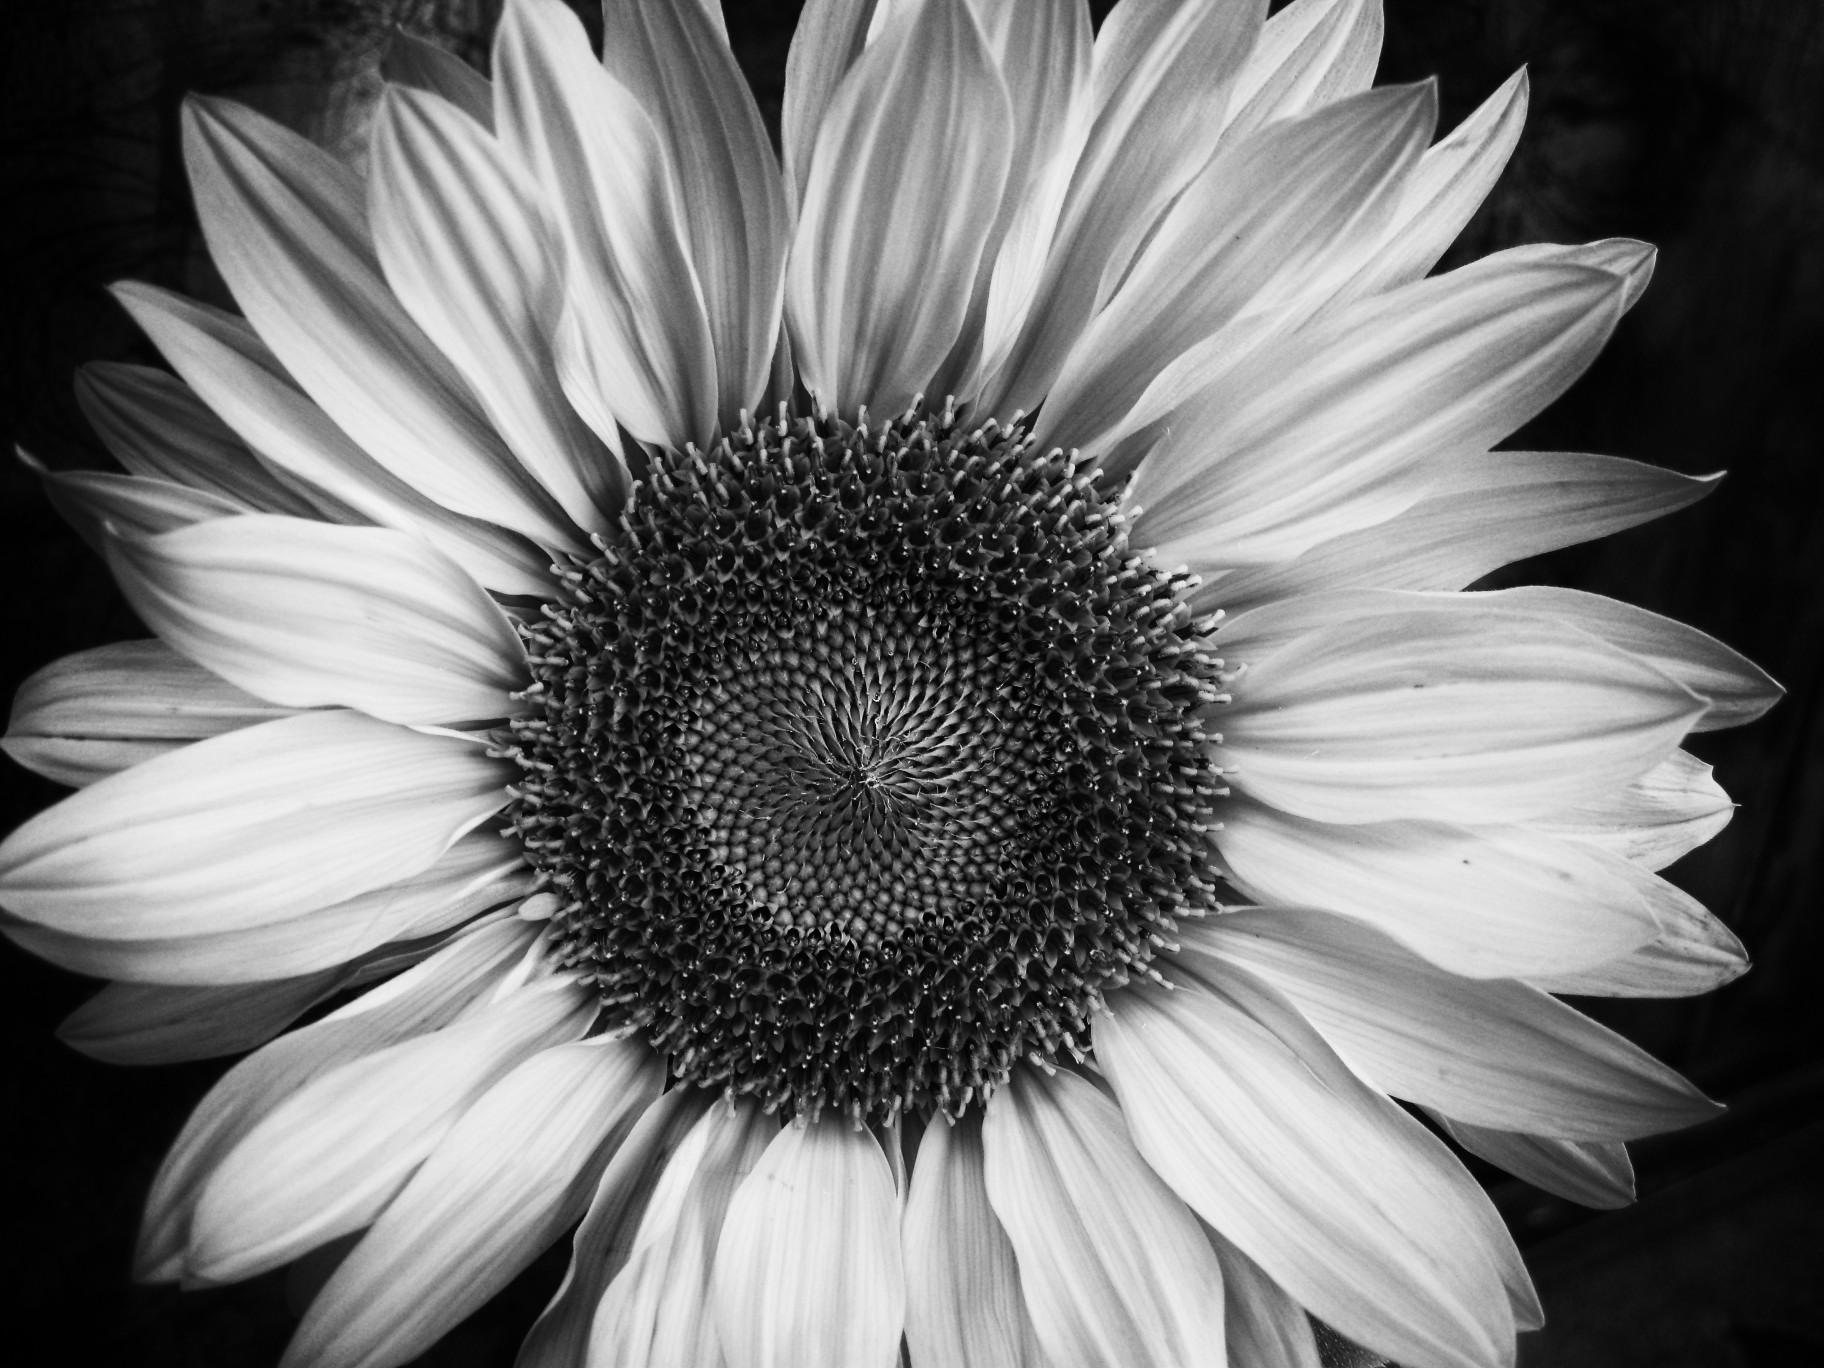 Fall Sunflower Desktop Wallpaper صور انستقرام ابيض واسود روعة بجودة Hd ميكساتك